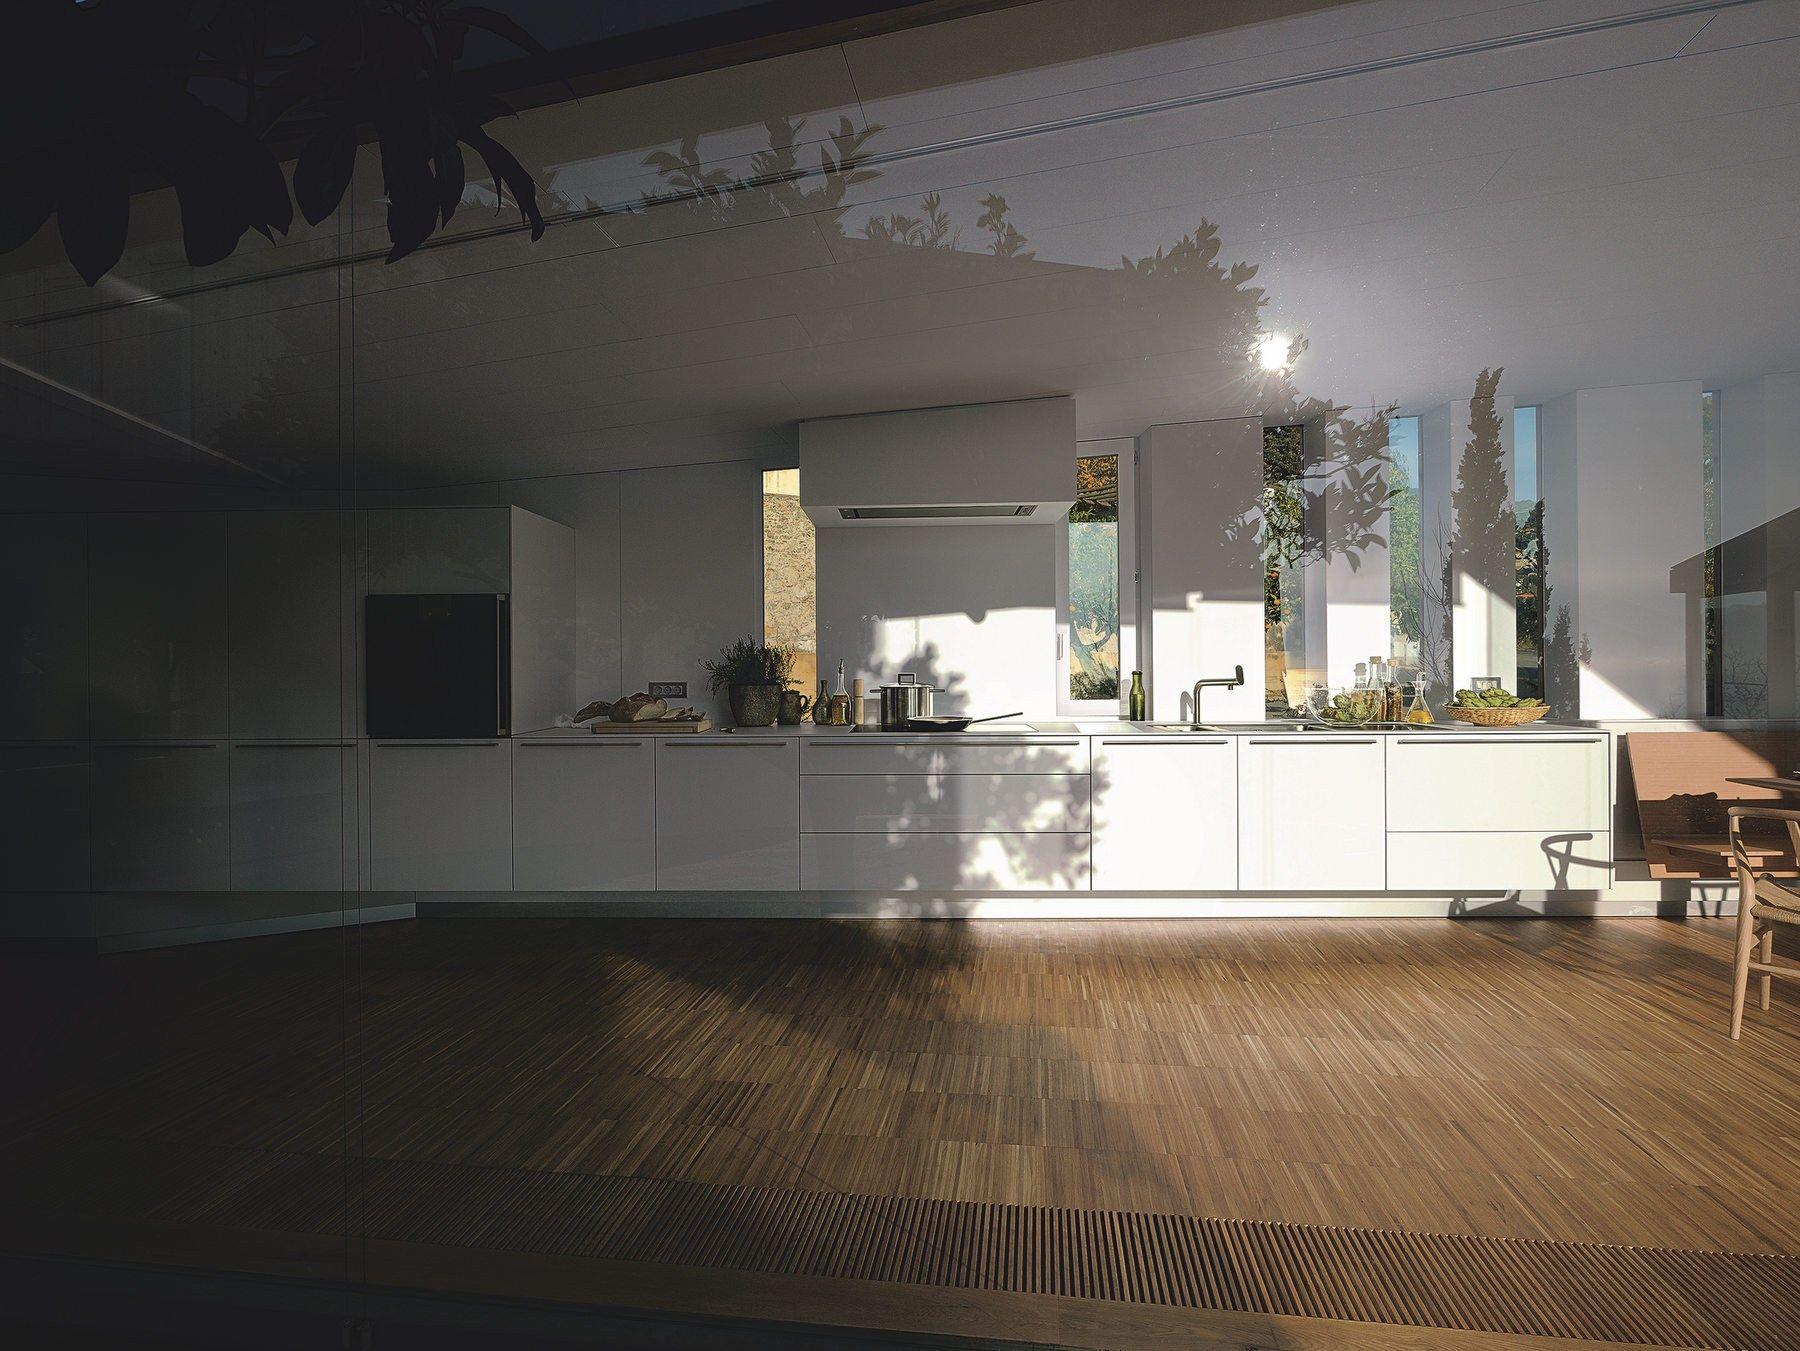 bulthaup mnchen free bulthaup b kitchen island with bulthaup mnchen with bulthaup mnchen. Black Bedroom Furniture Sets. Home Design Ideas